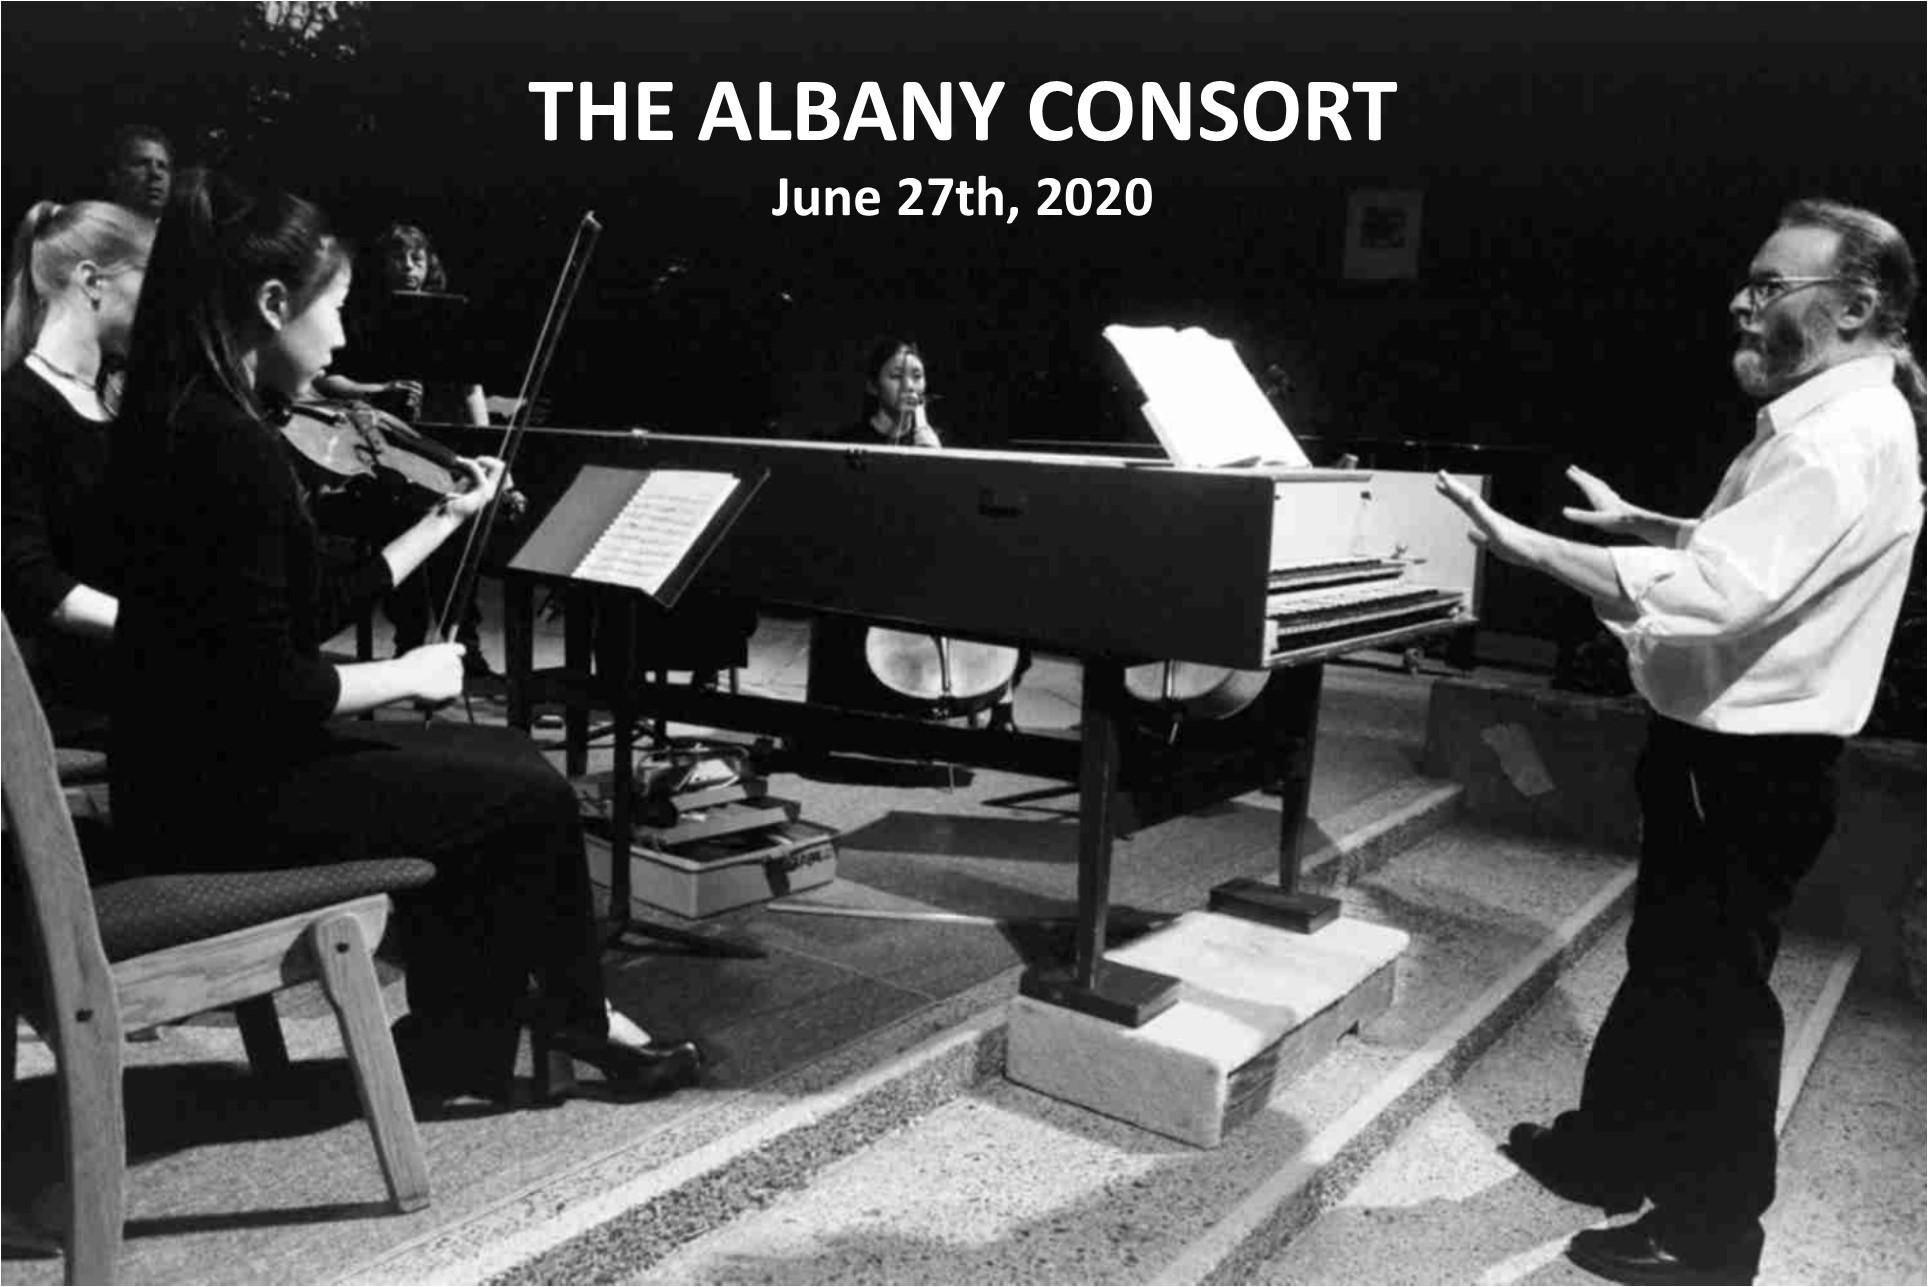 Albany Consort carousel.jpg